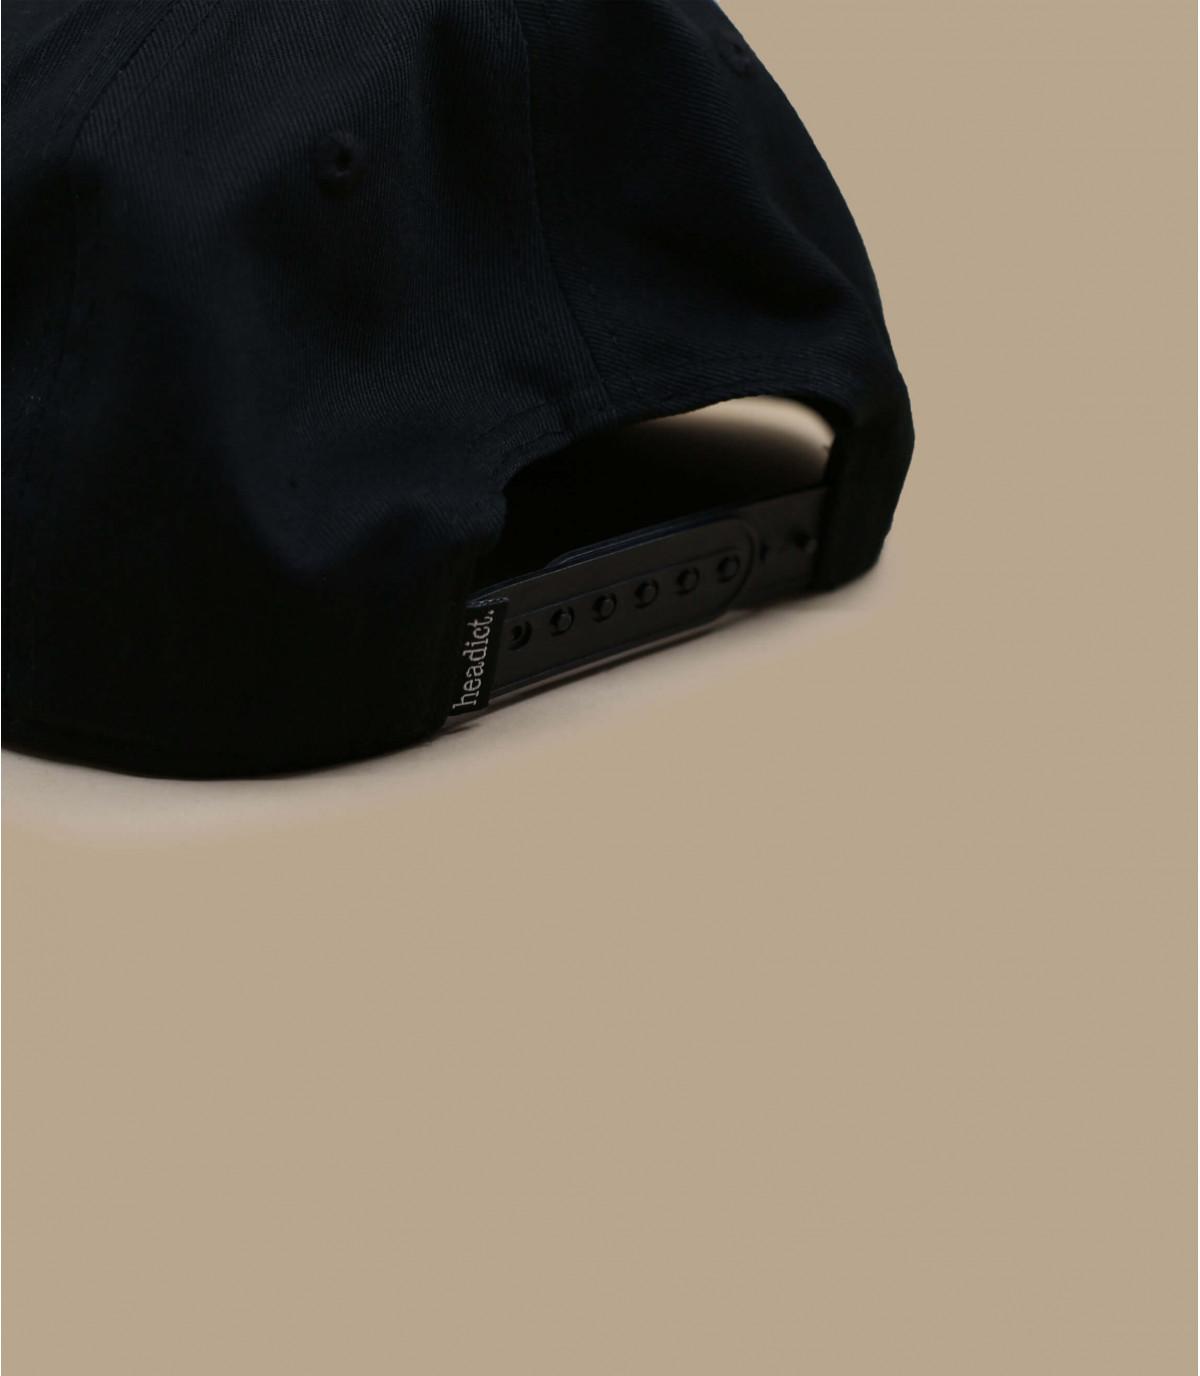 Details Snapback alter Seewolf - Abbildung 4